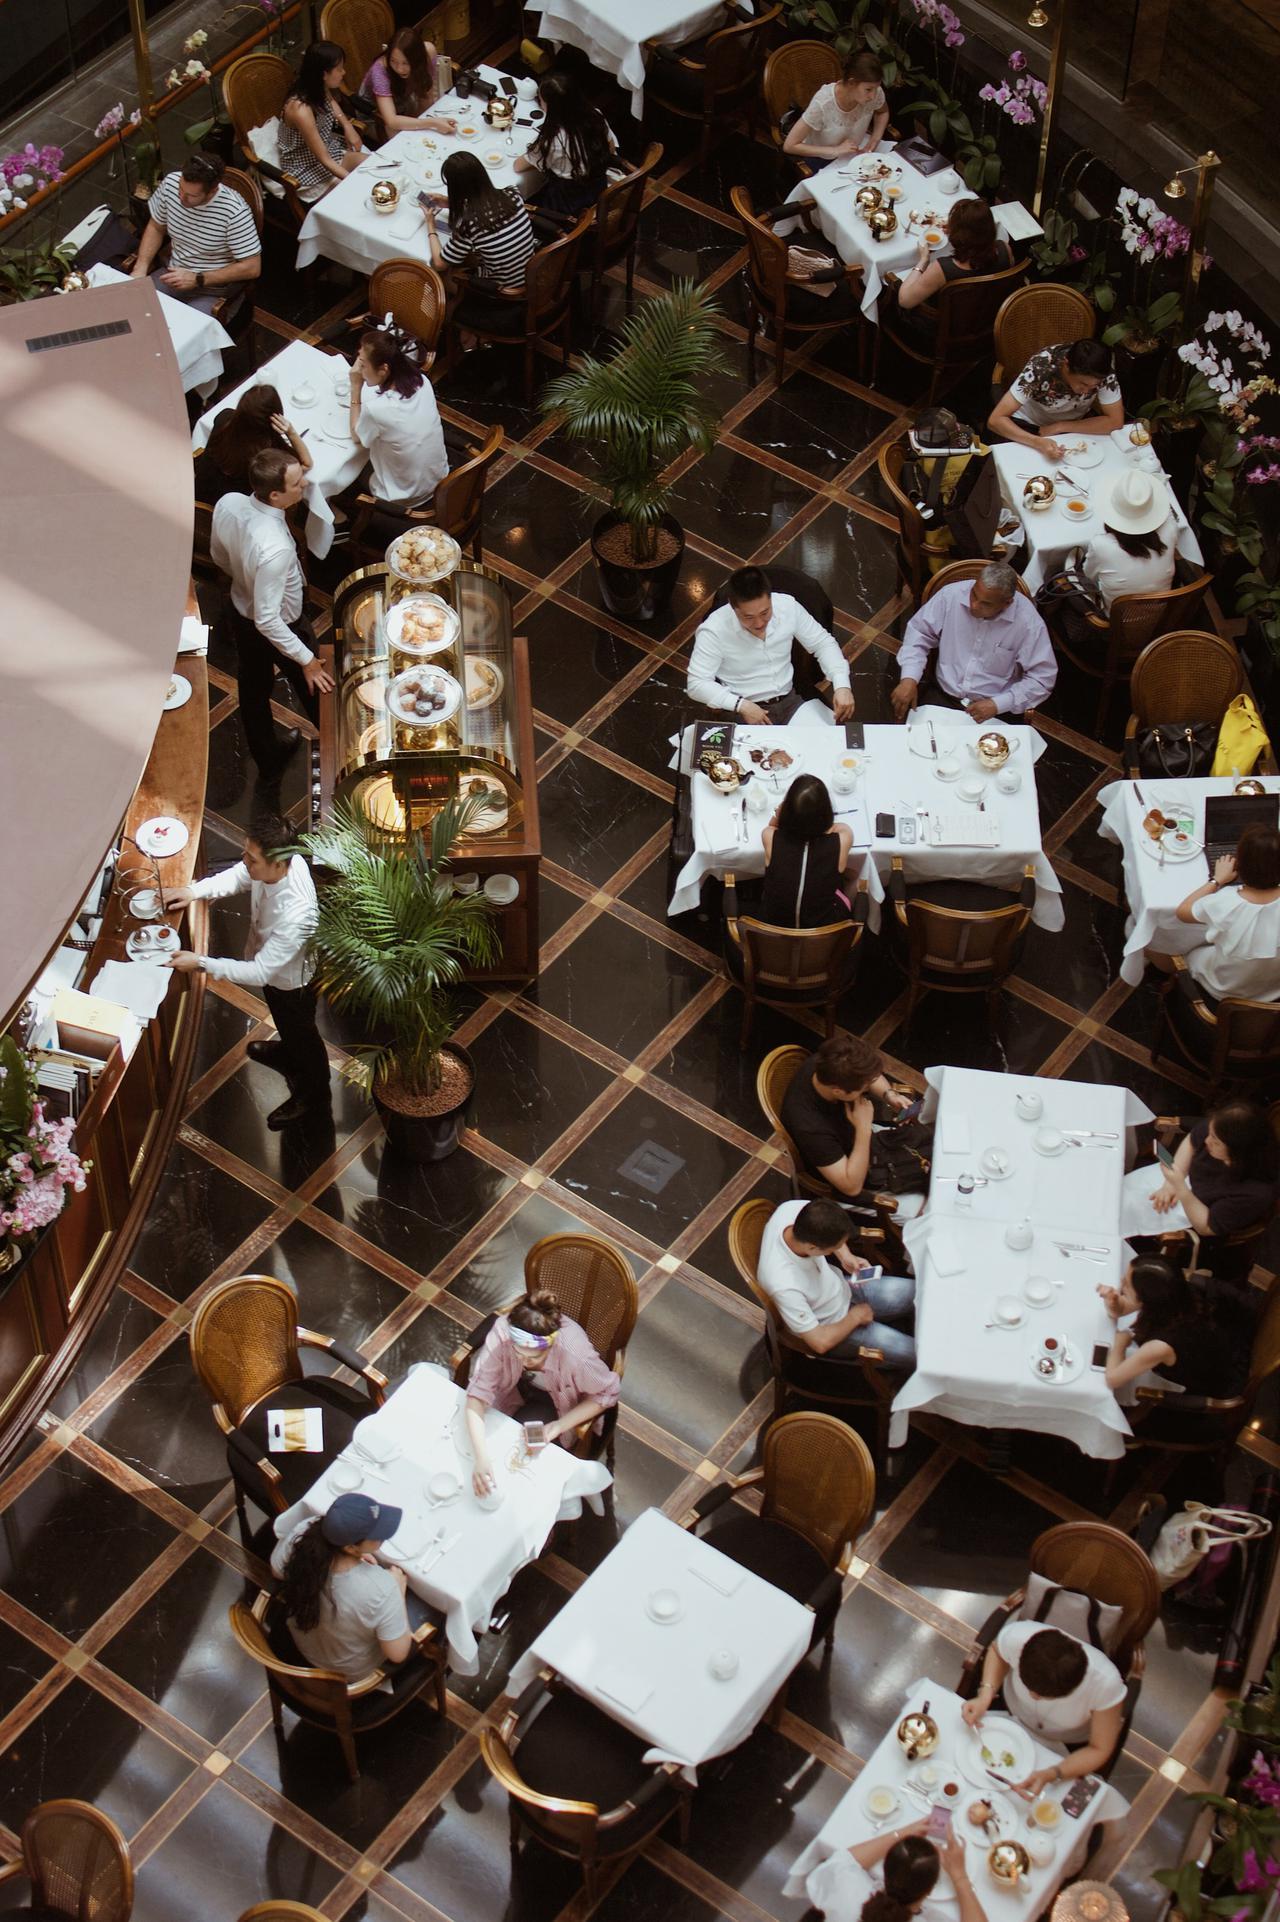 Restaurant bookkeeping in NYC can help businesses operate at peak efficiency.